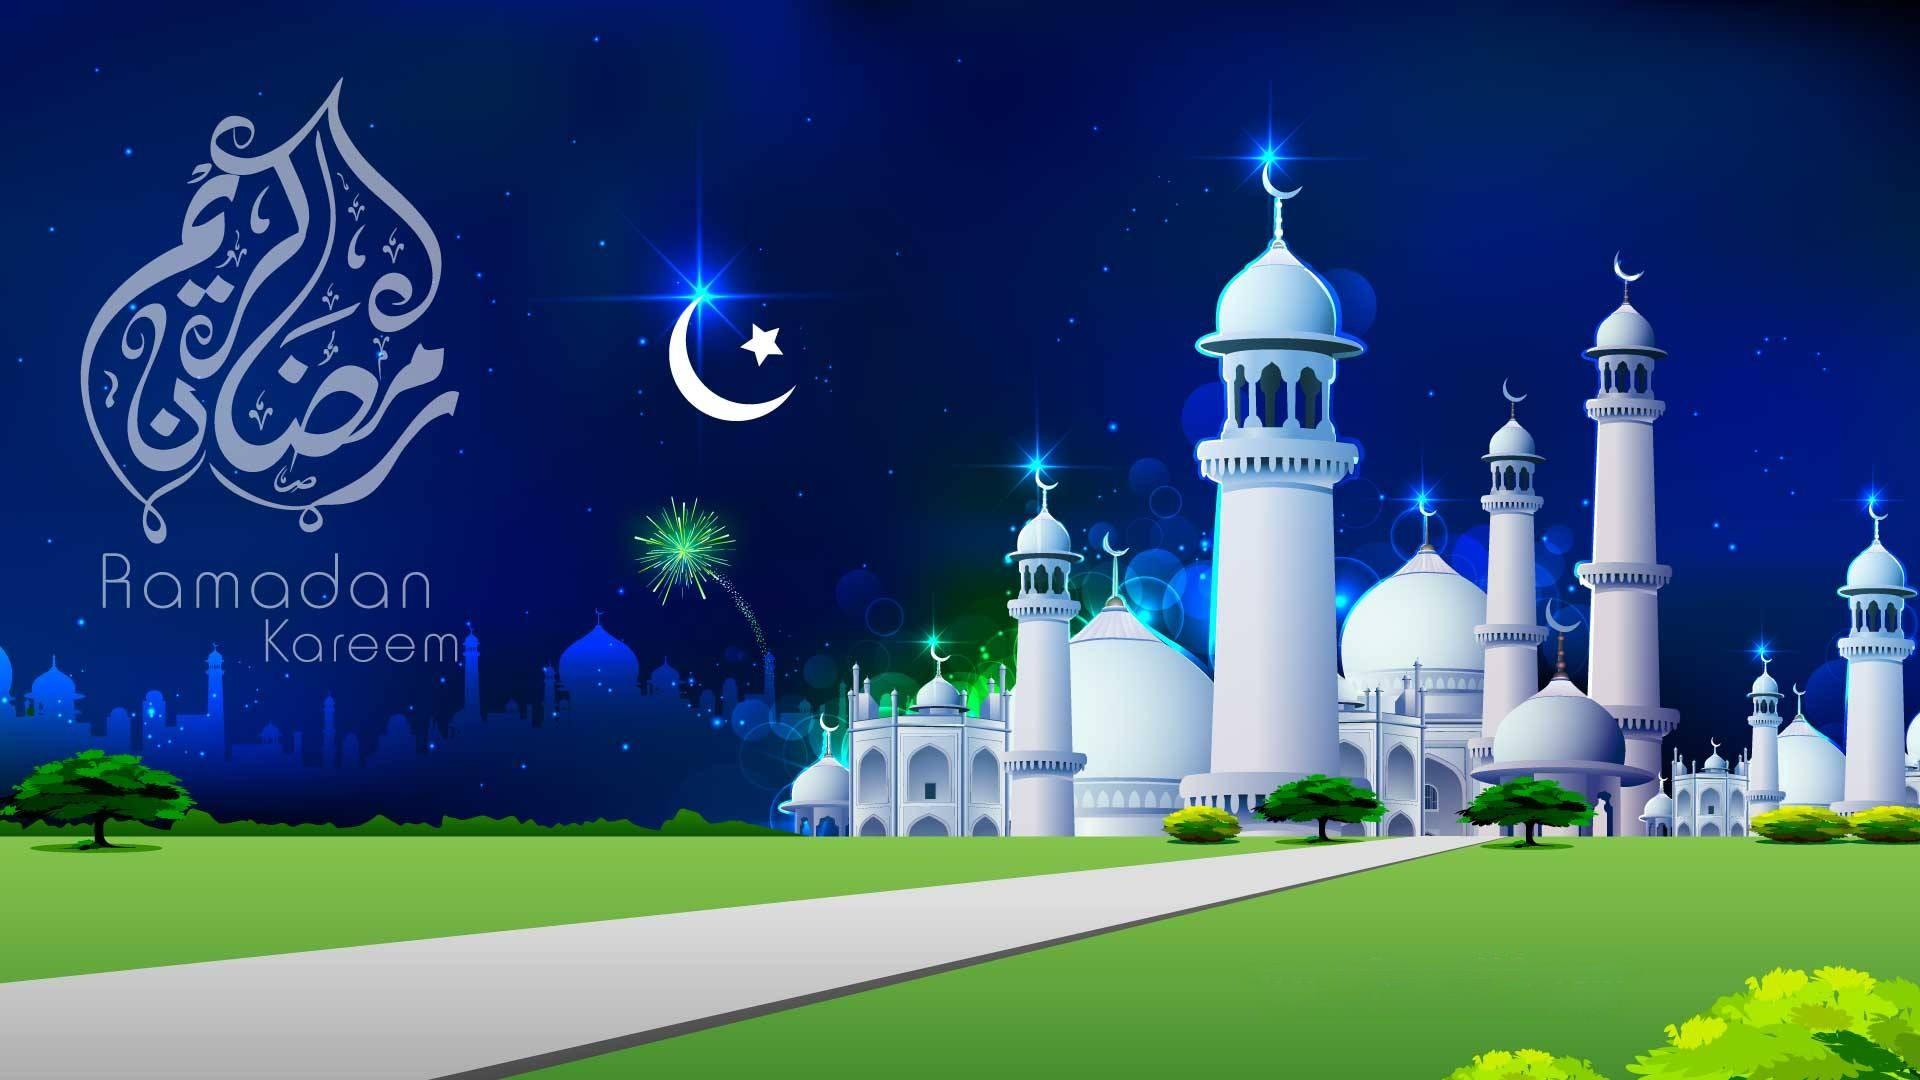 Ramadan 2017 wallpapers